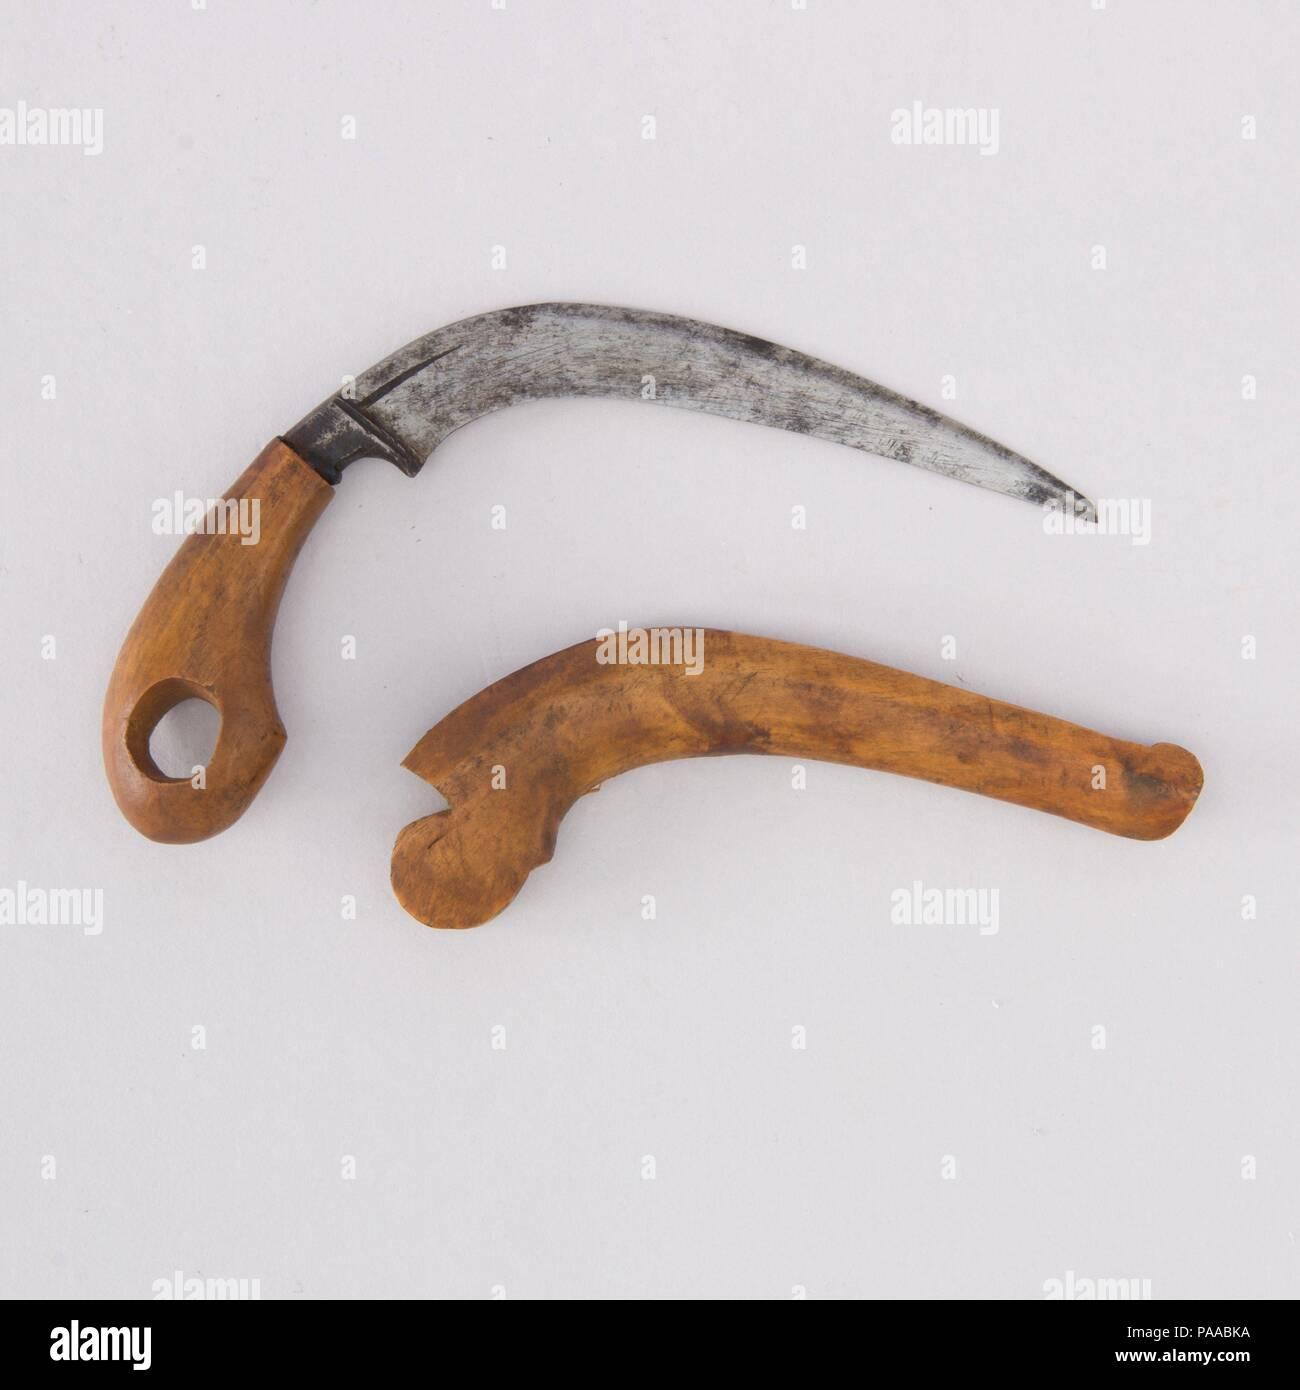 Knife (Korambi) with Sheath  Culture: Indonesian, Sulawesi